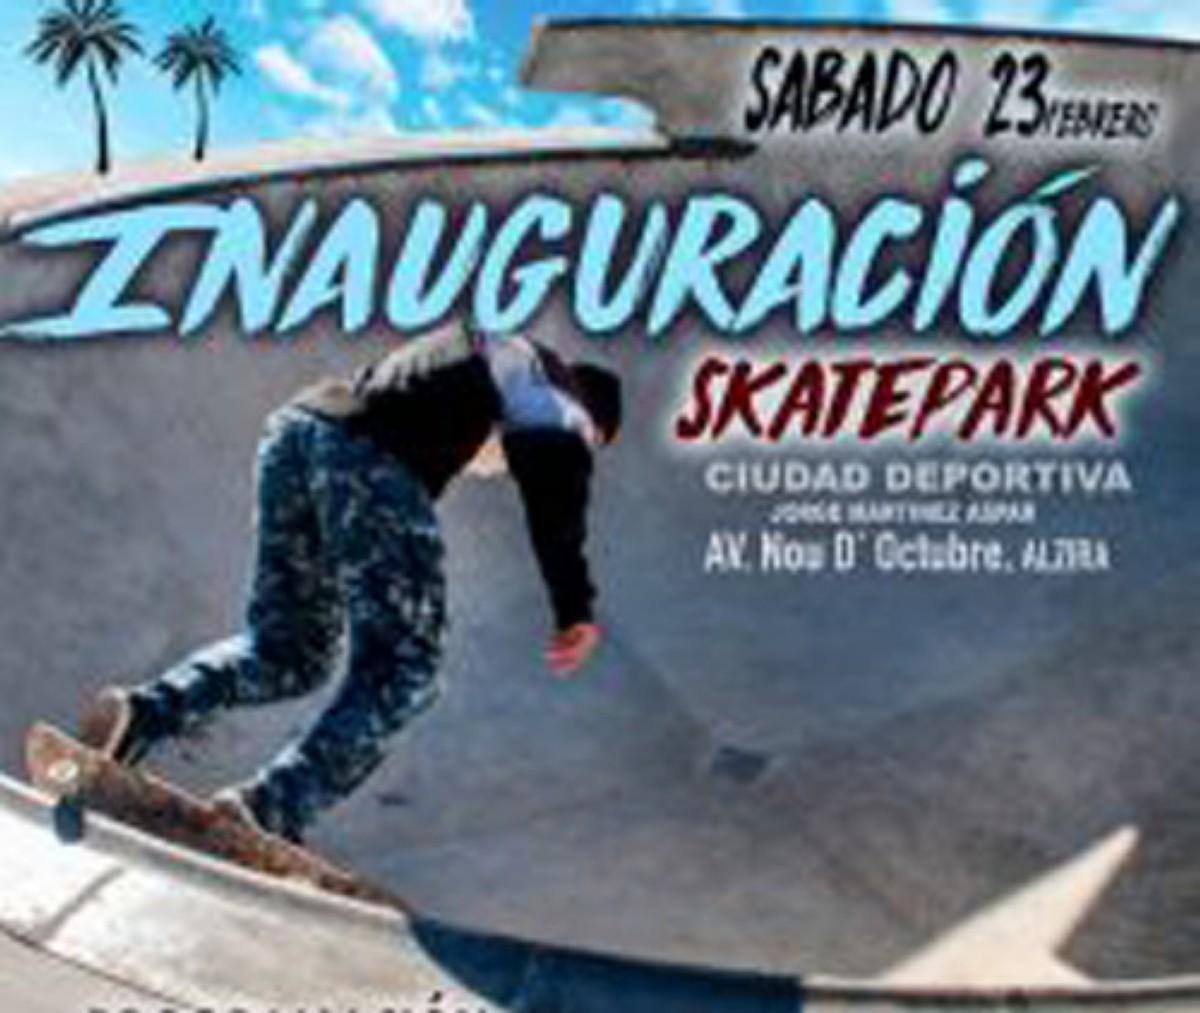 Inauguración del Skatepark de Alzira